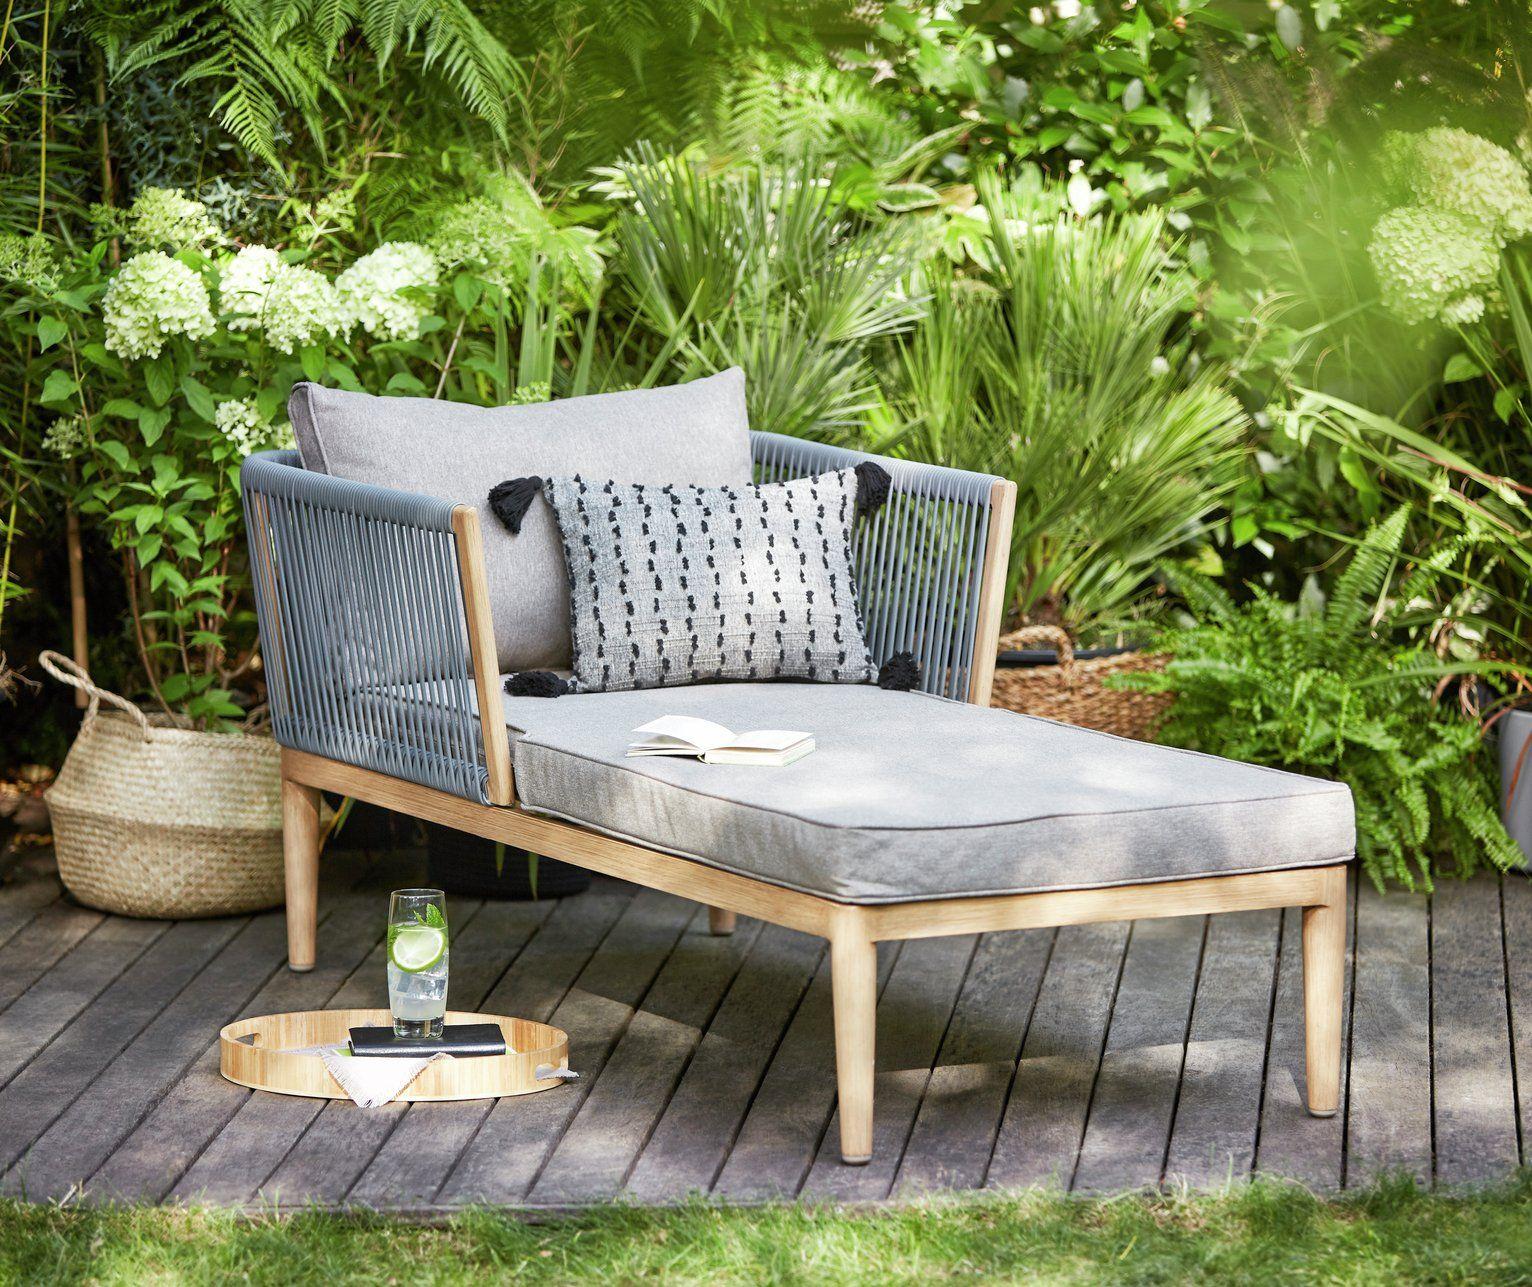 18 Garden Sun Loungers For 2021 Best Garden Loungers To Buy